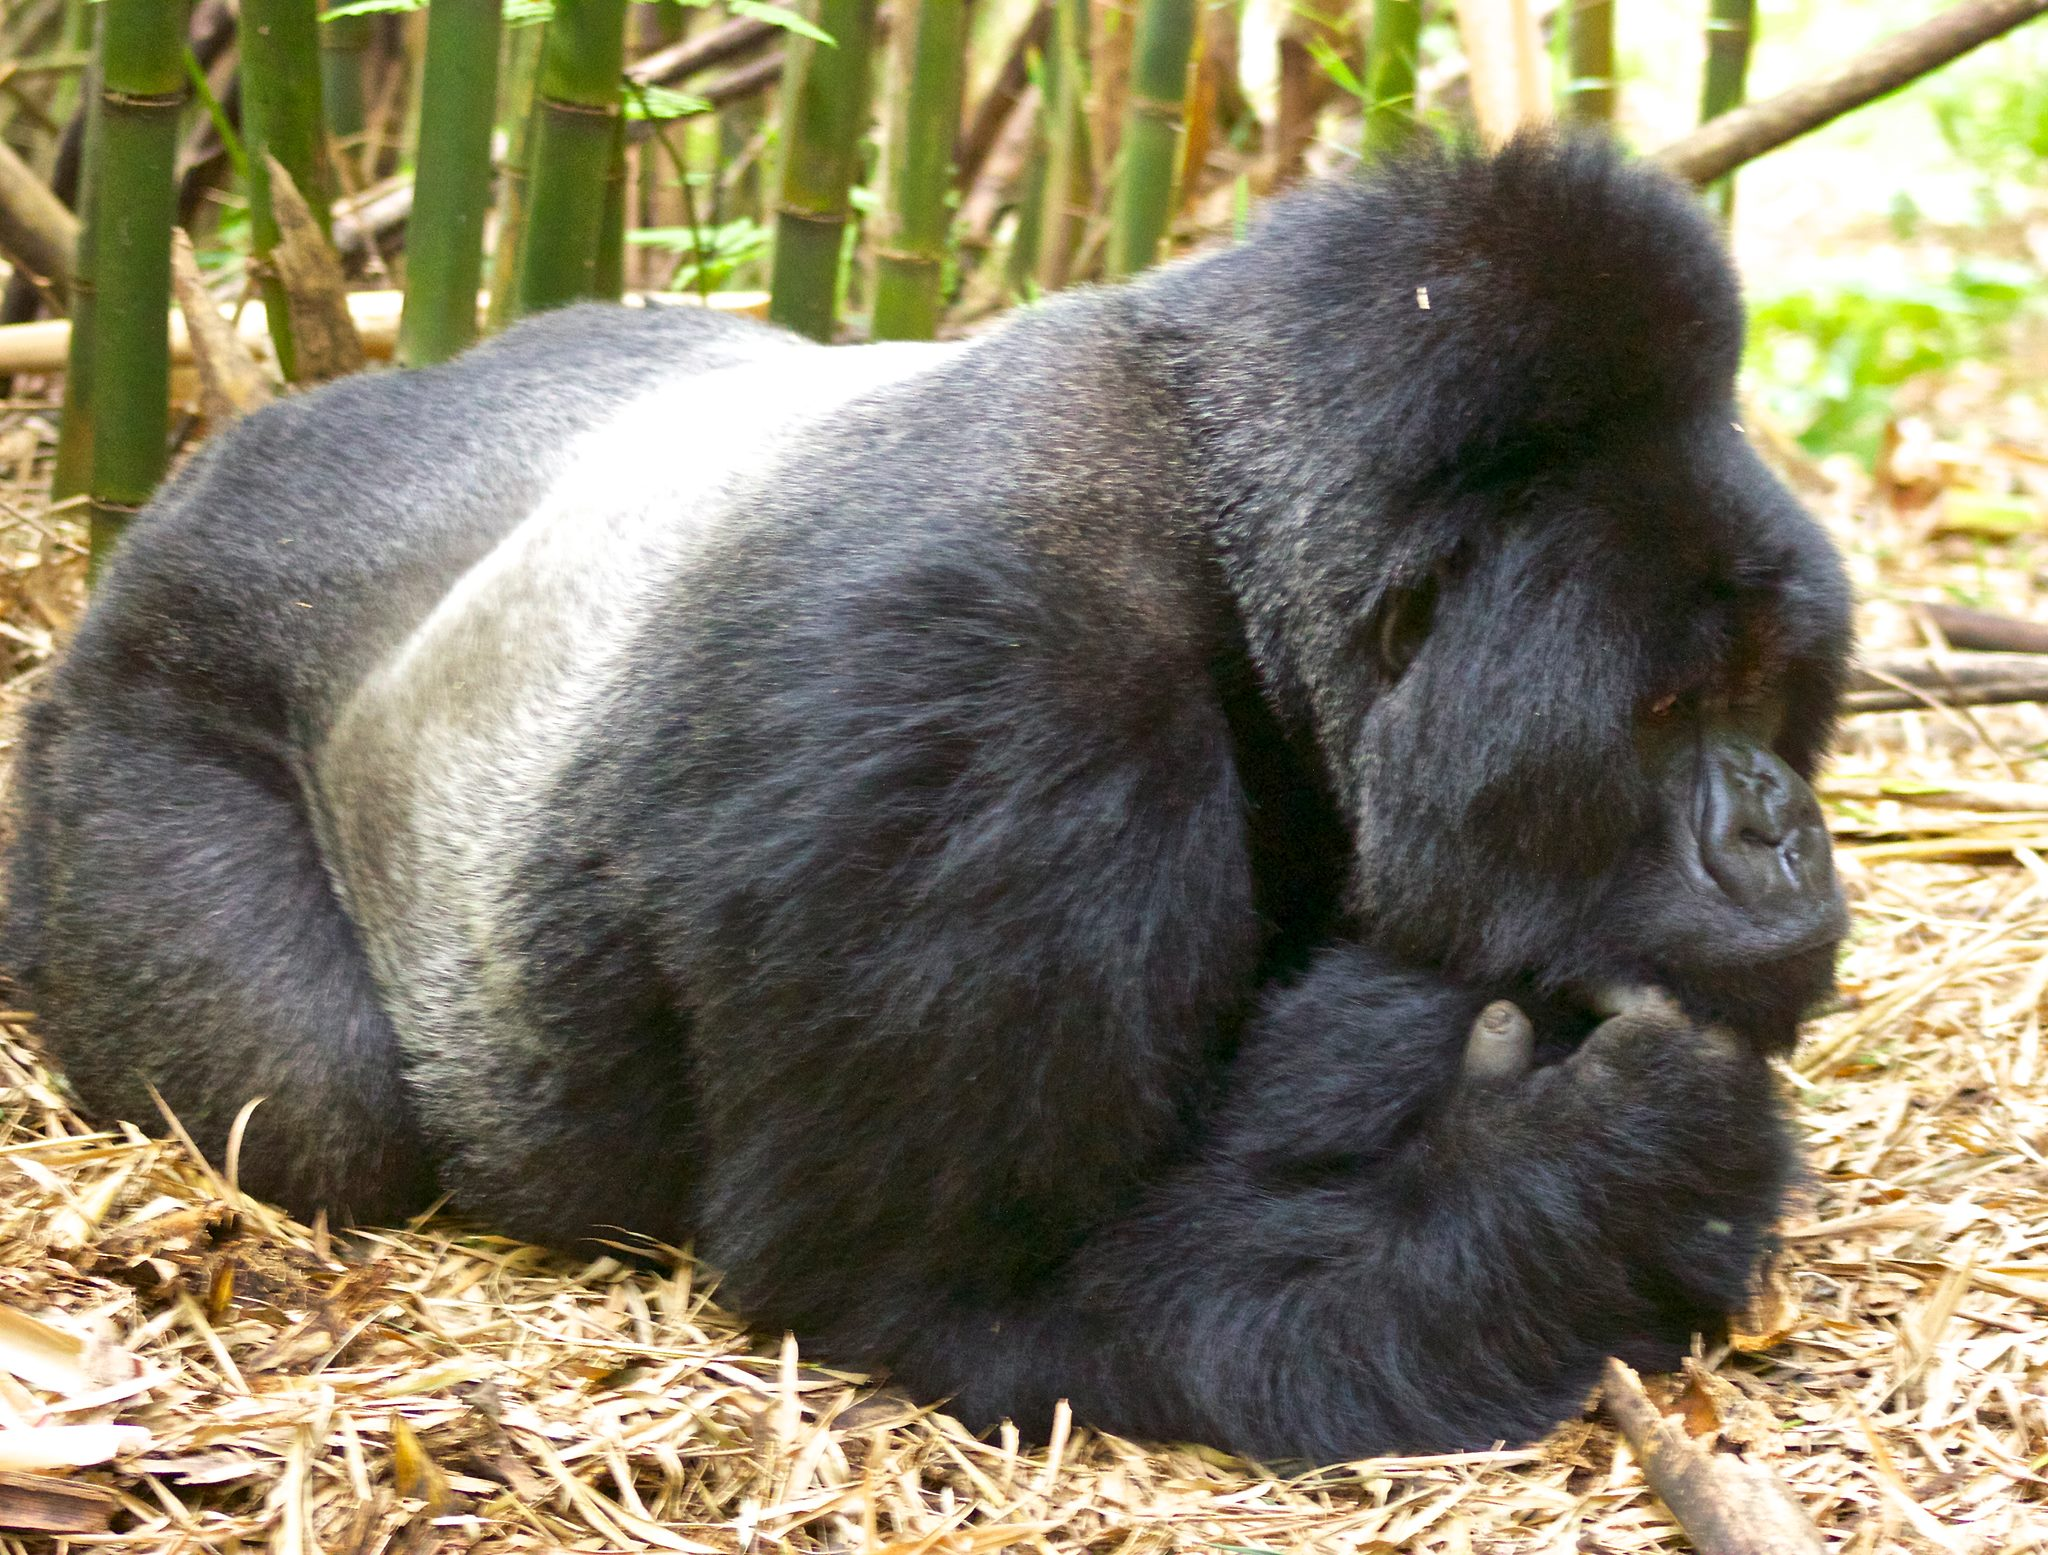 Gorilla Trekking trips